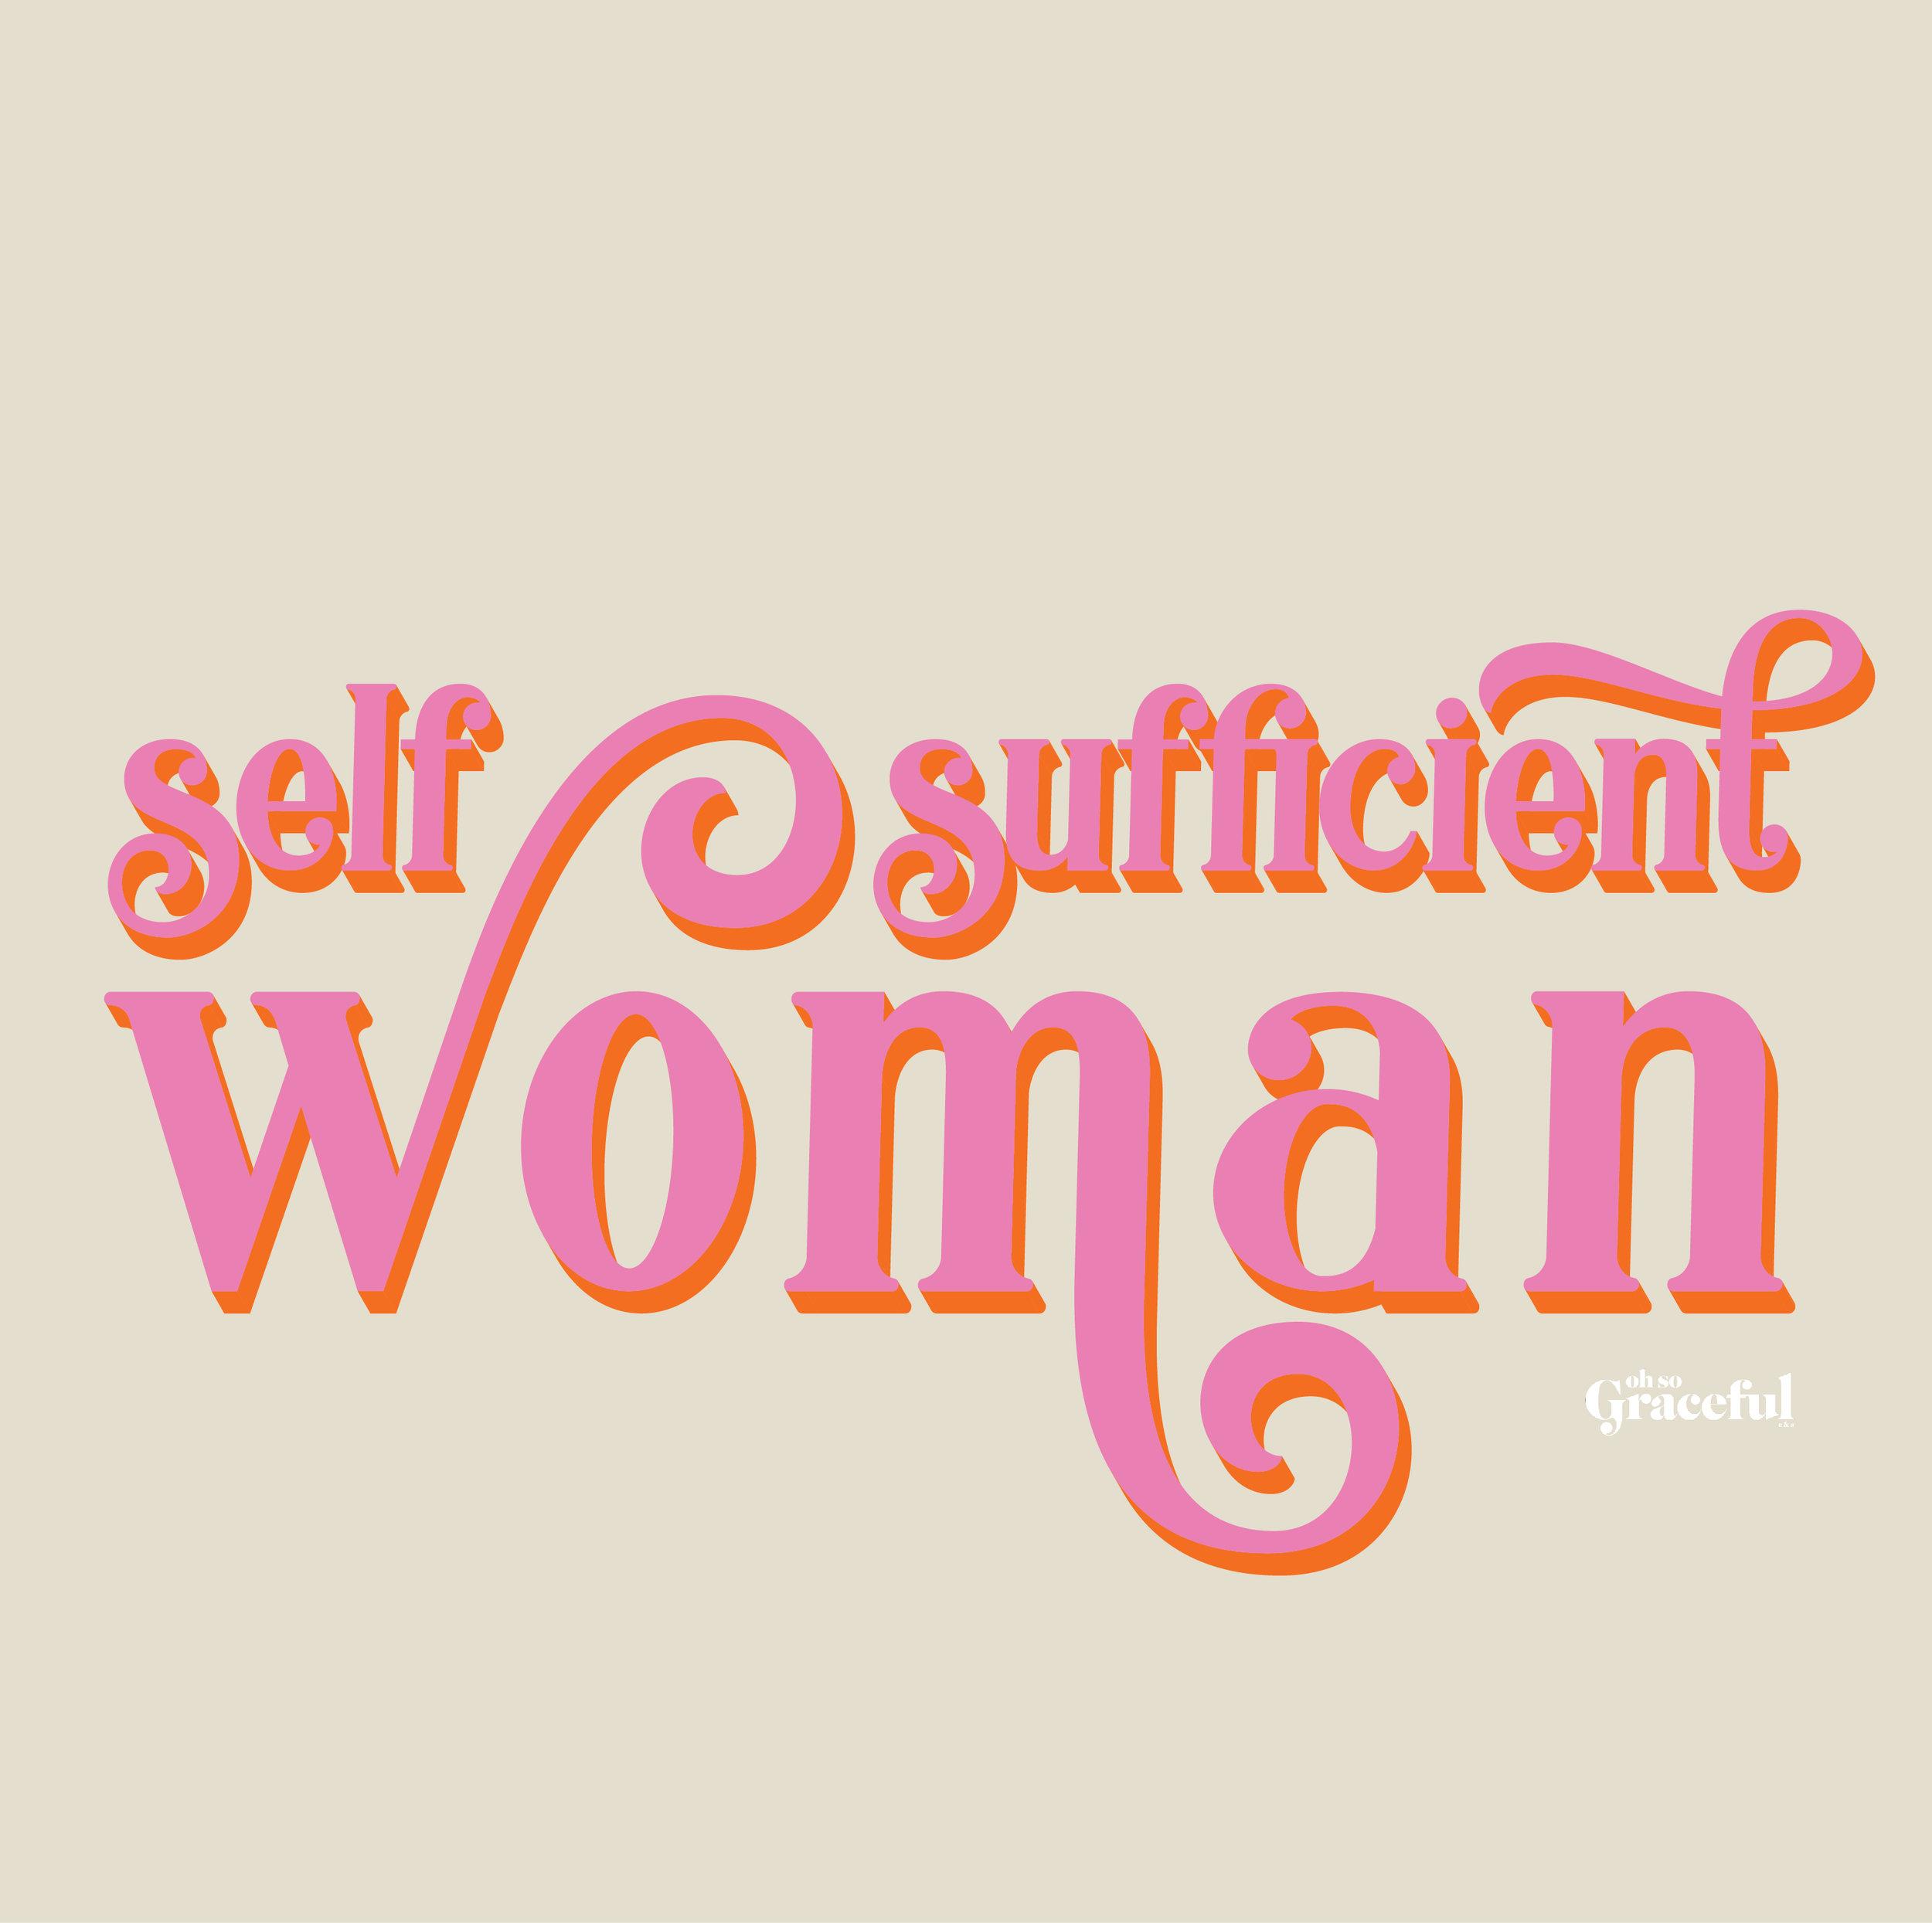 selfsufficient4.jpg